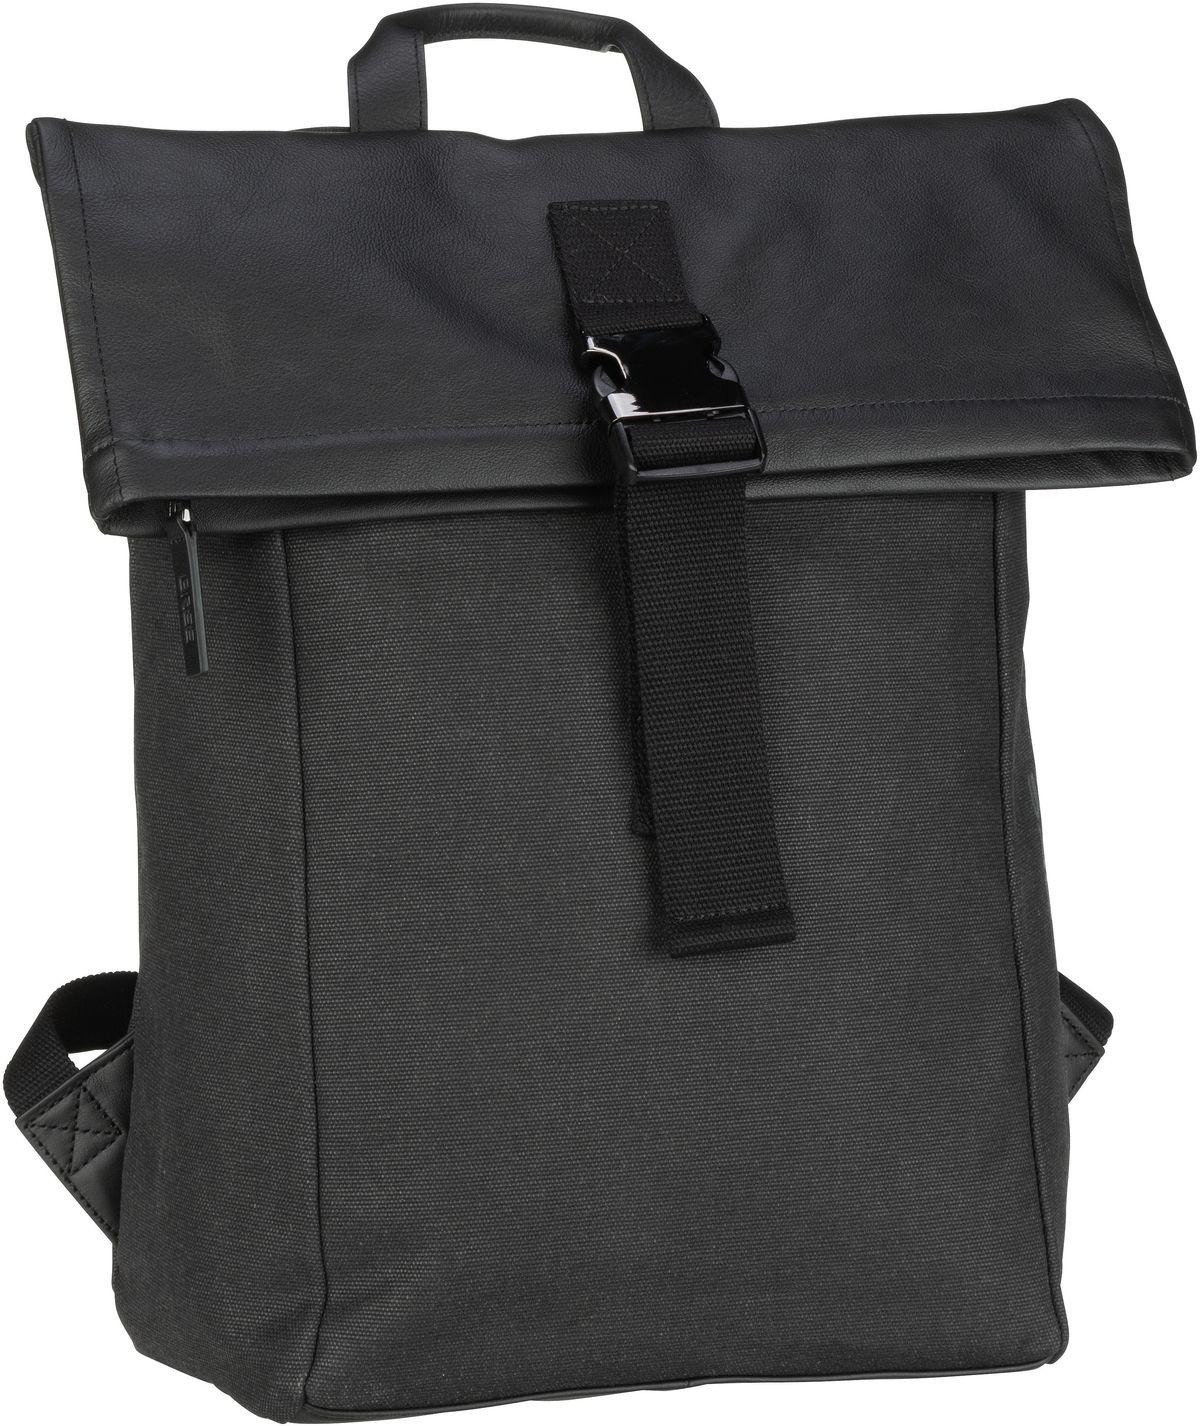 Rucksack / Daypack Punch Casual 92 Anthra/Black